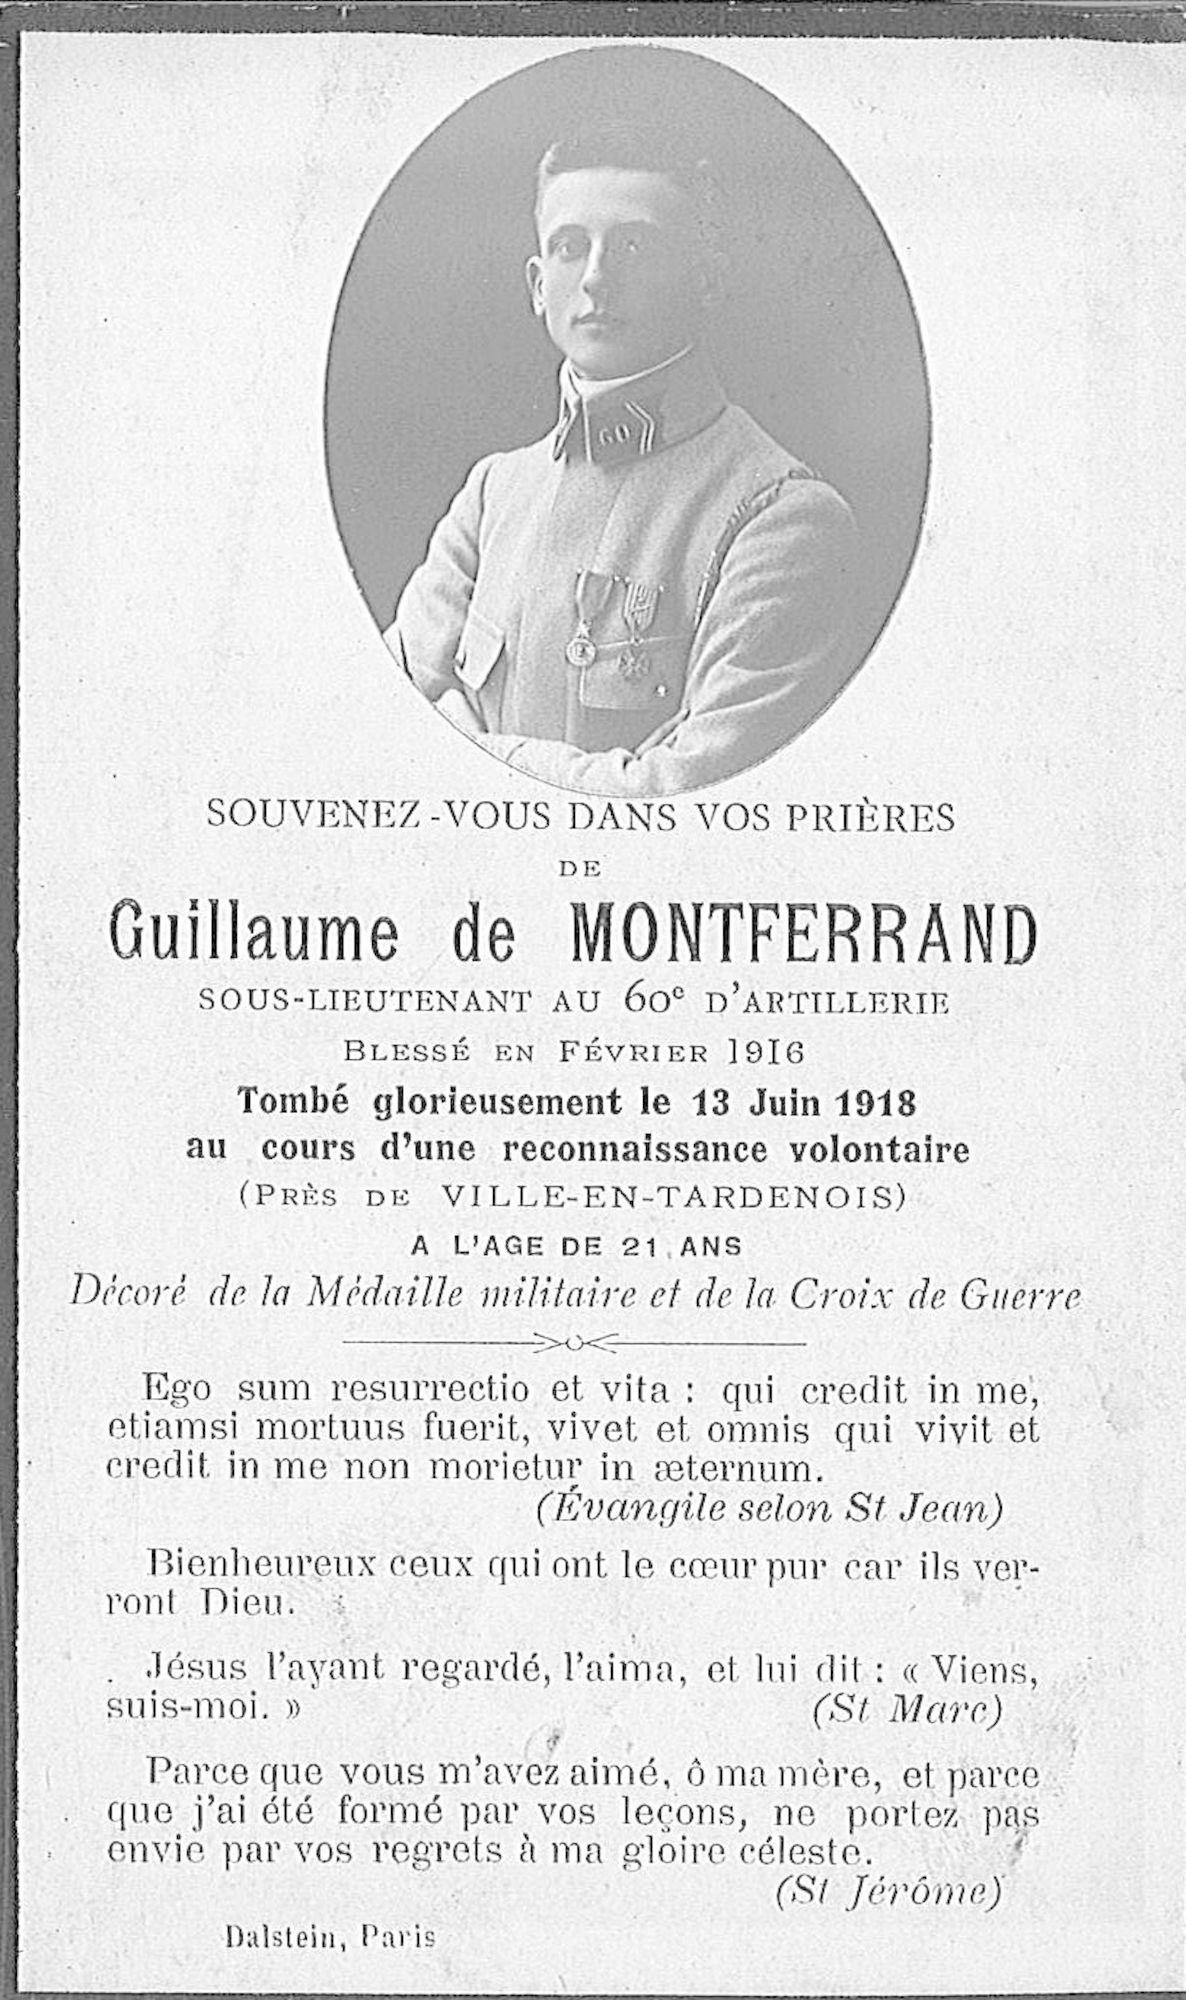 Guillaume de Montferrand